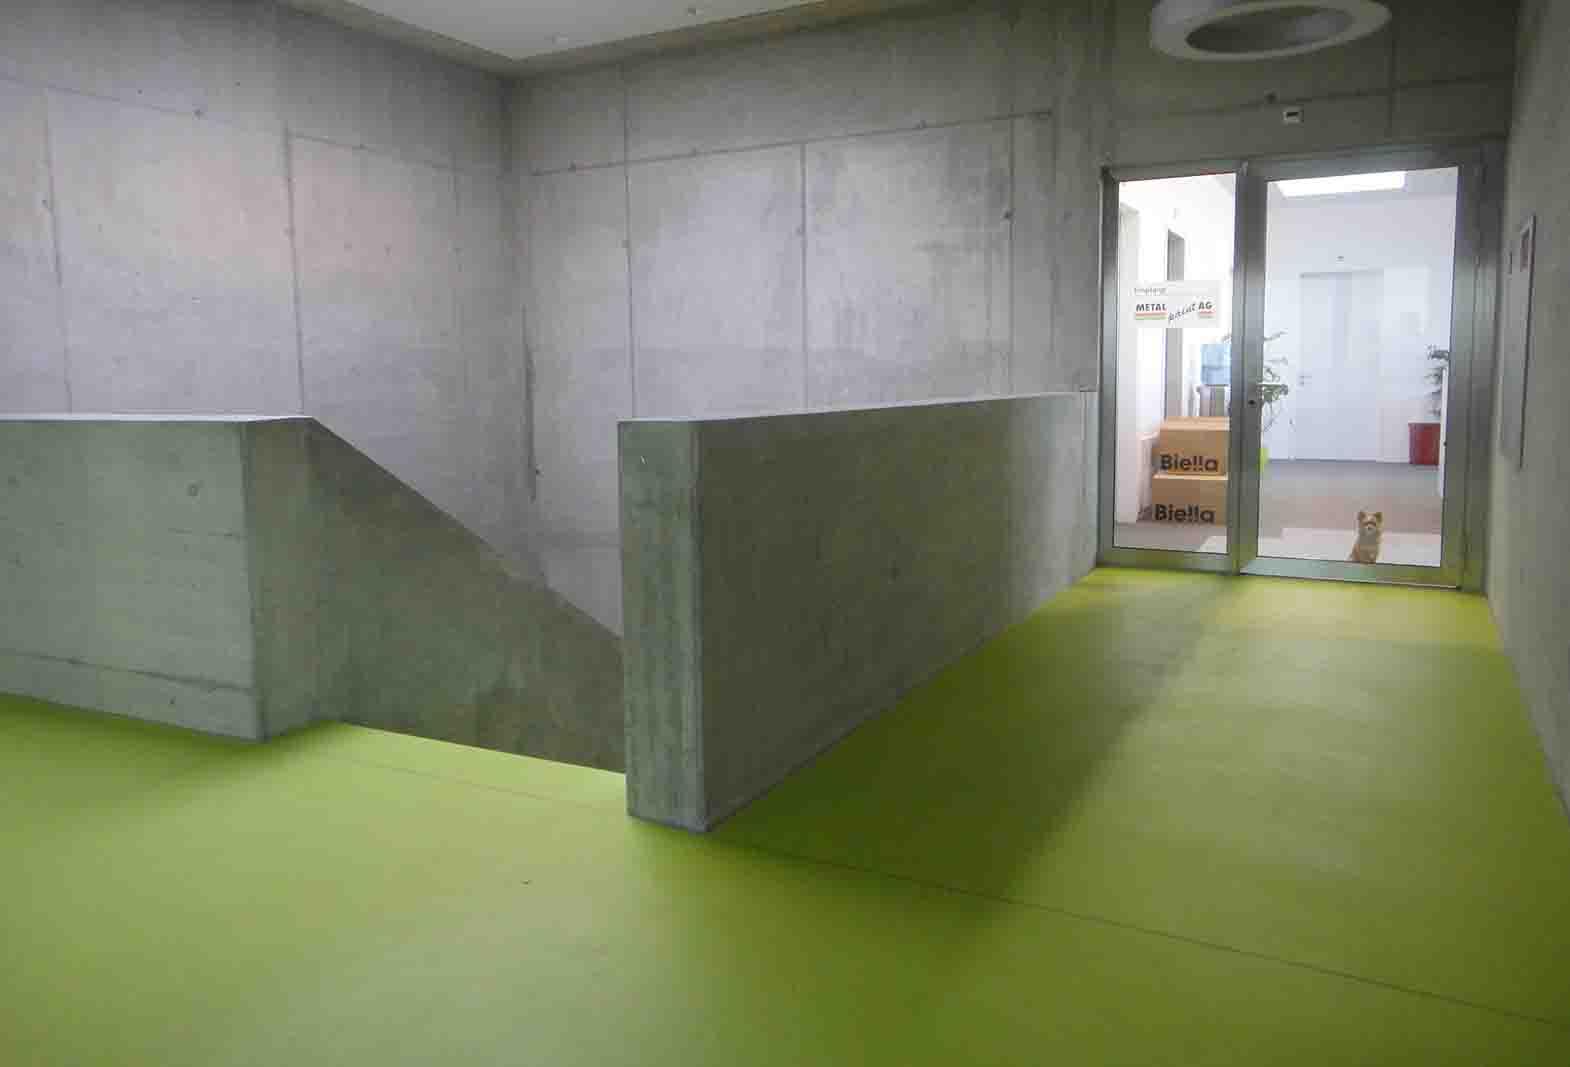 Debrunner Acifer Ruedi Weber ROWODECO - Zementspachtelbelag ROWOLINE - Wandspachtelbelag ROWOPUR - Polyurethanbelag